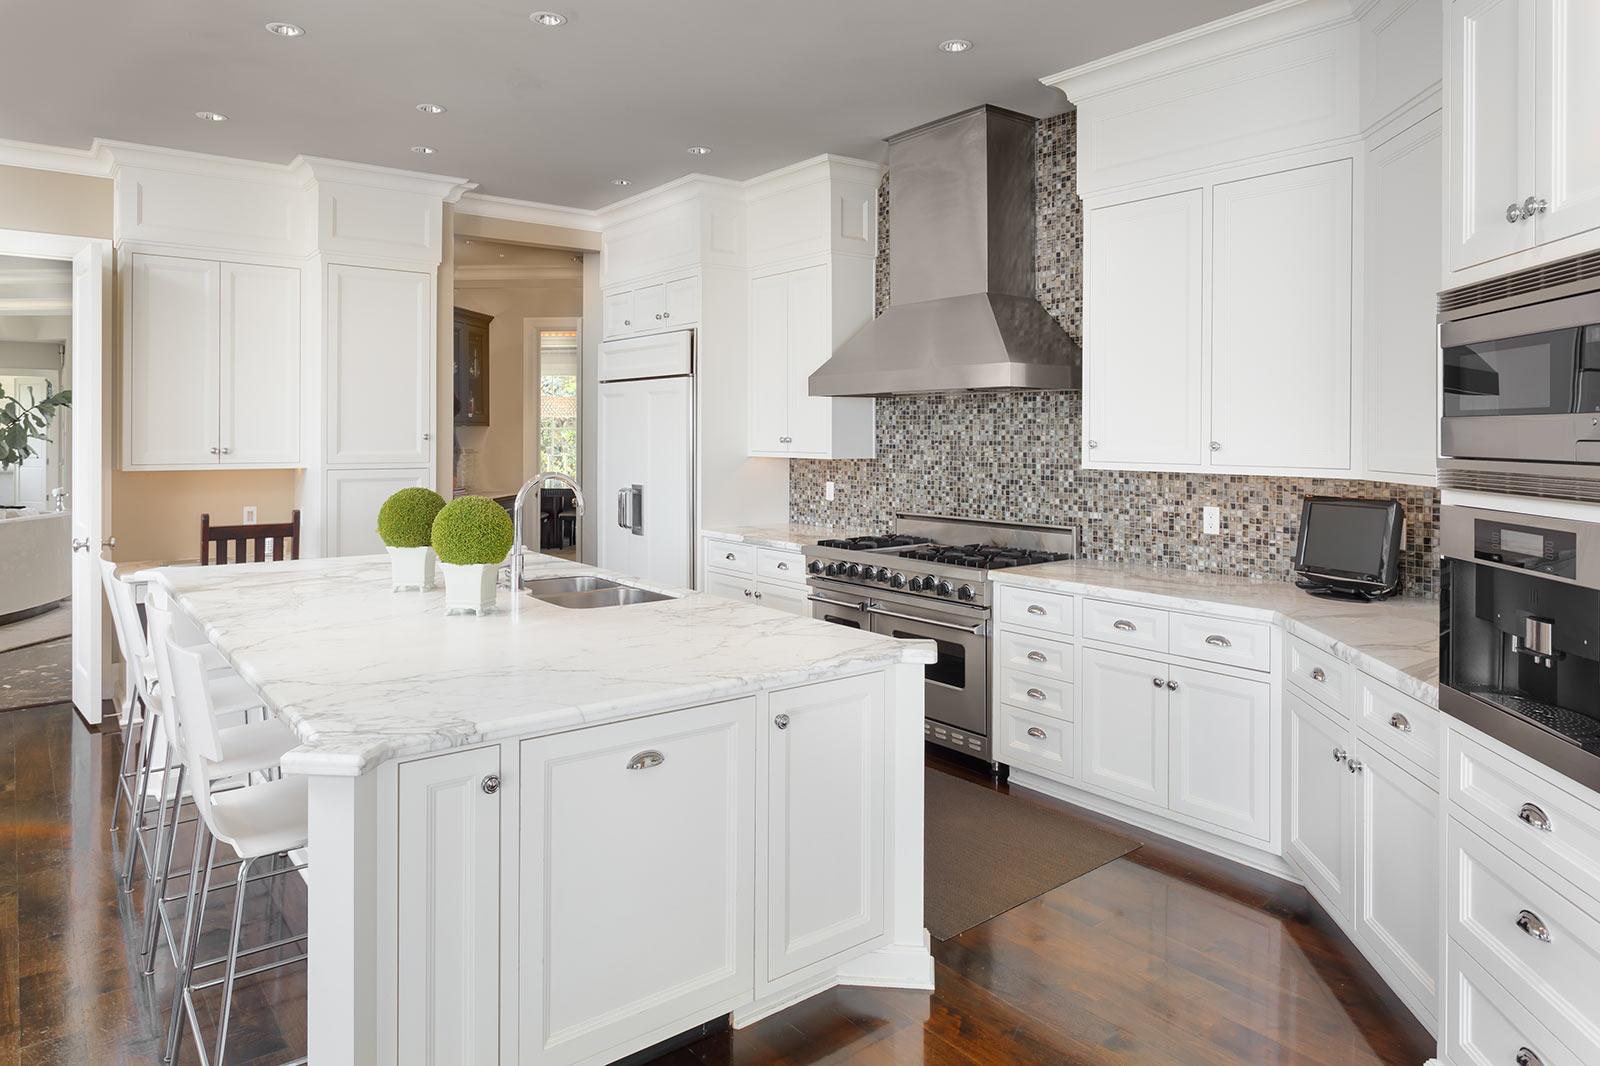 Home | Baltimore Kitchens